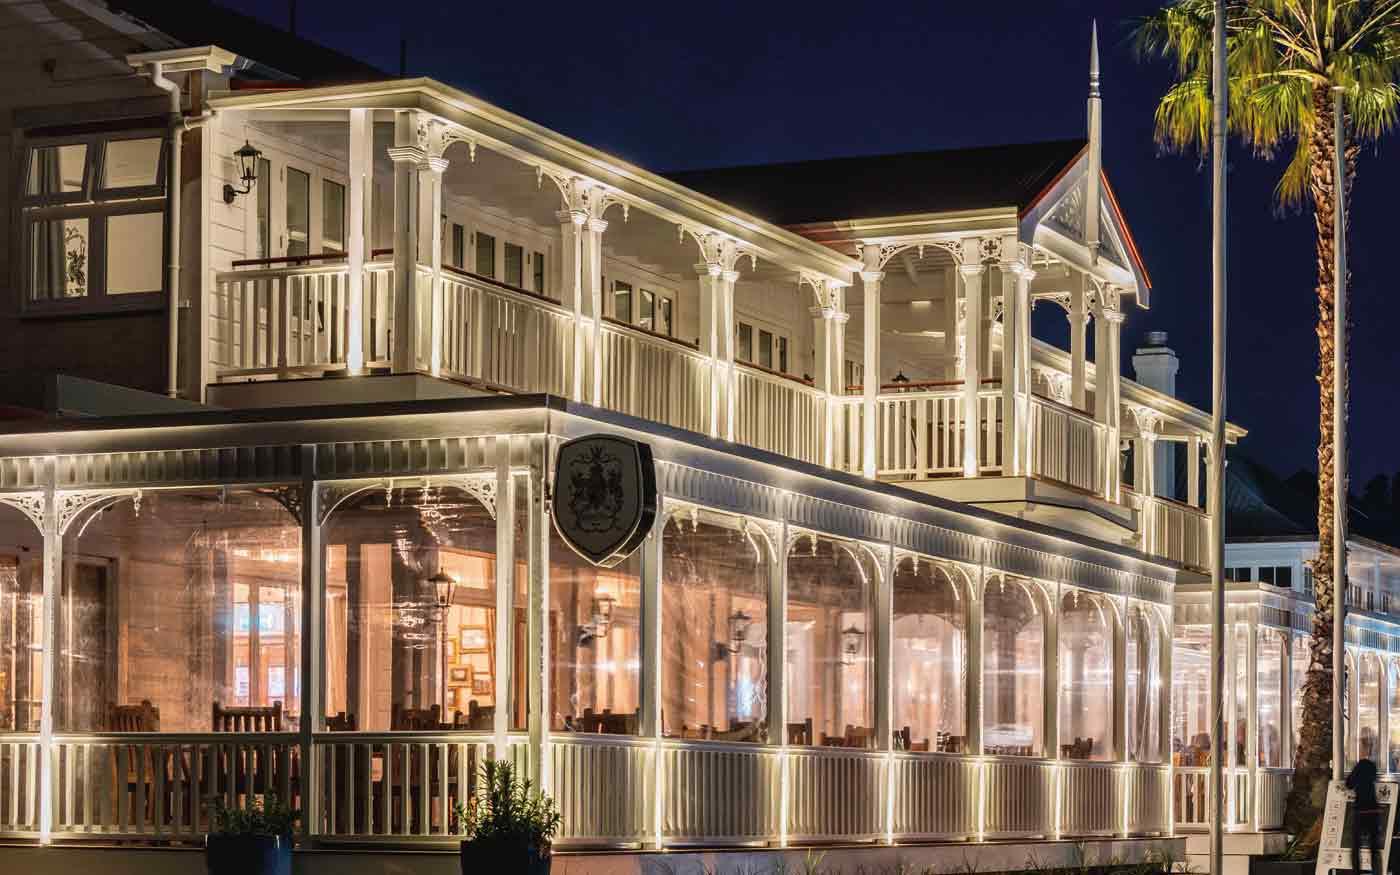 The Duke of Marlborough Hotel / NZ